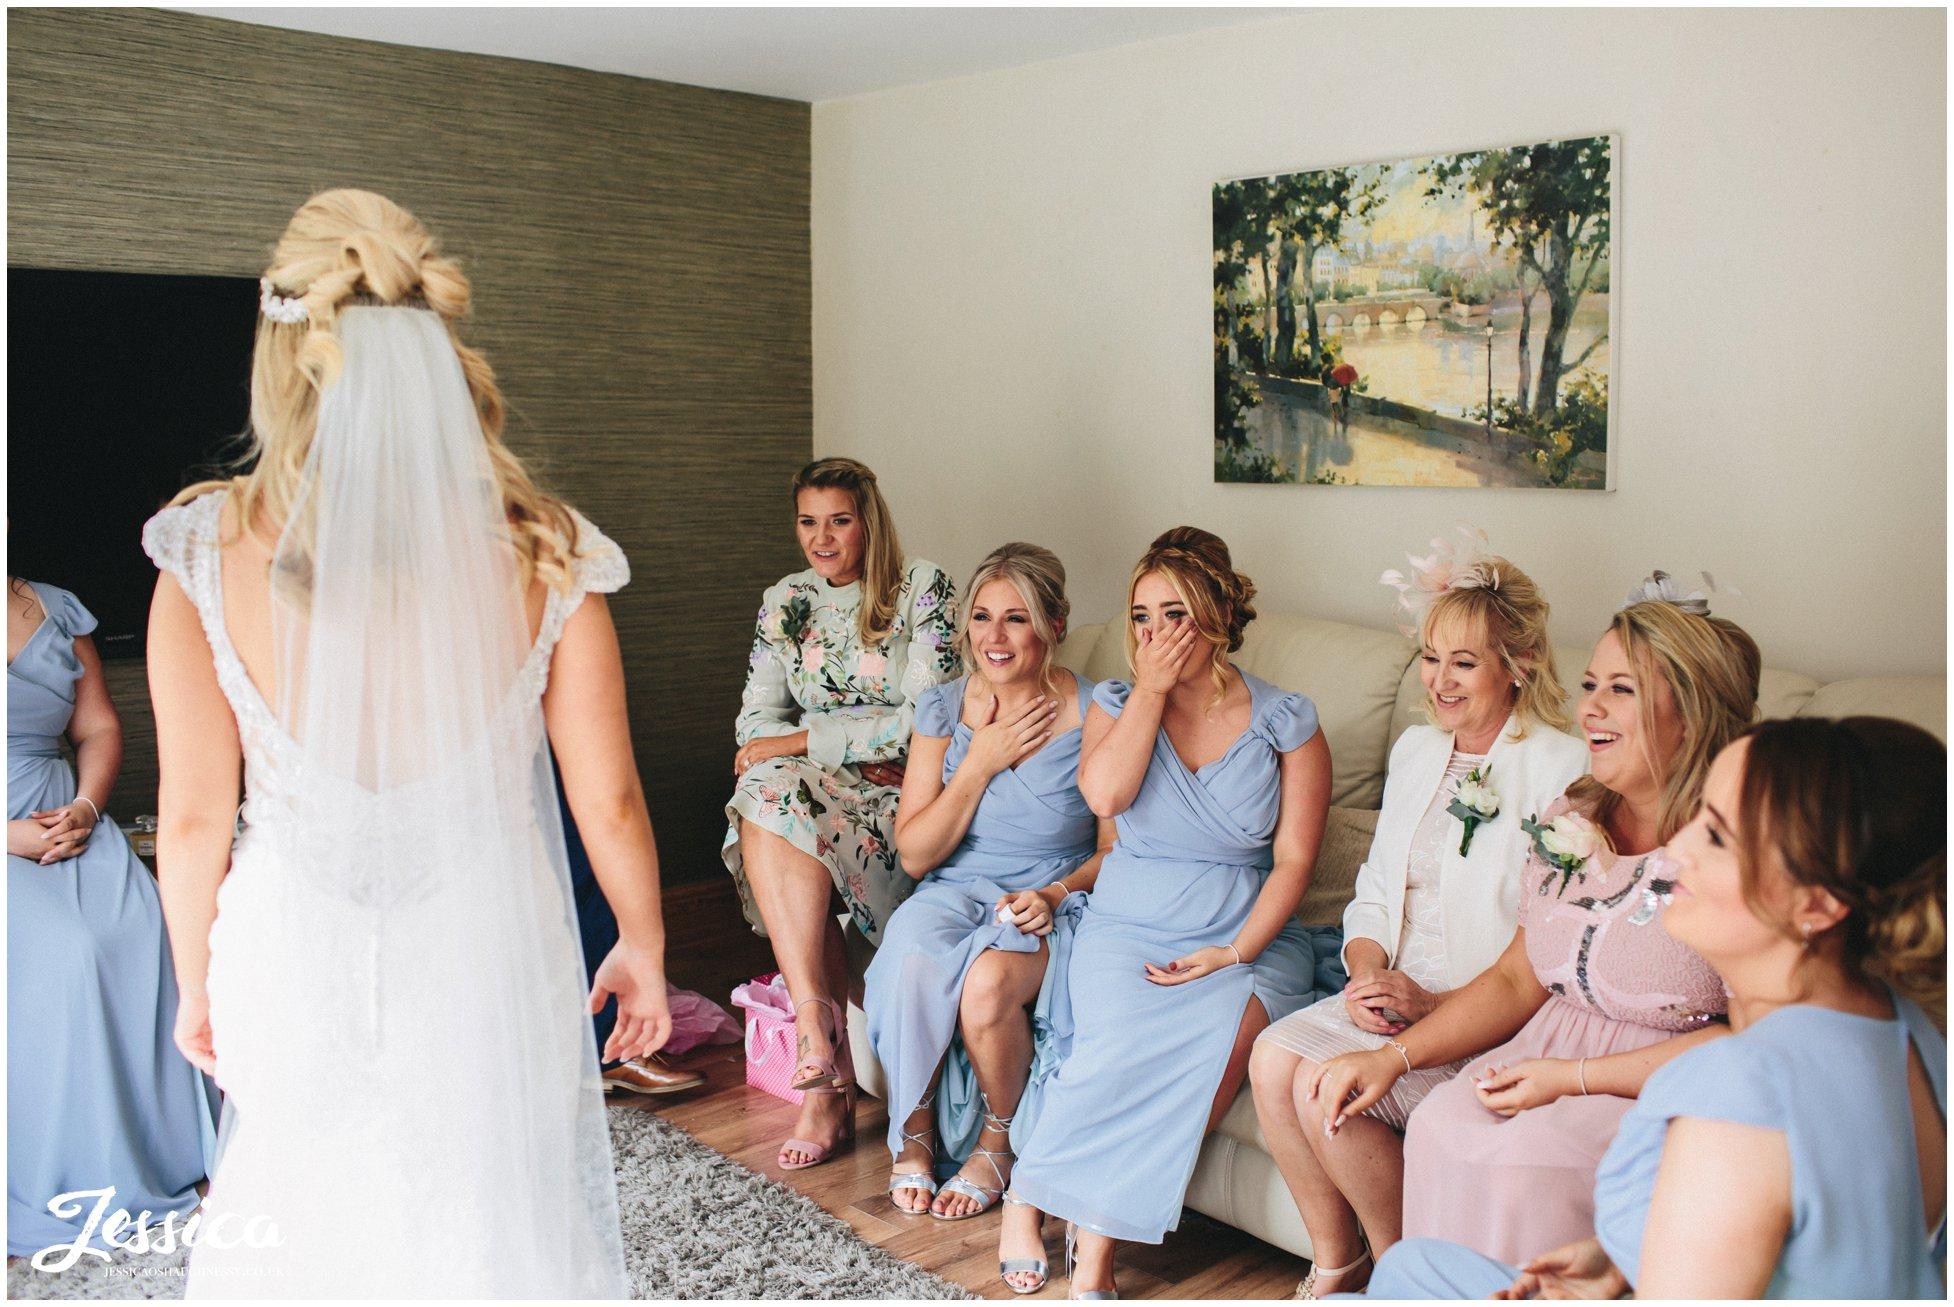 bridesmaids gasp at bride in her wedding dress